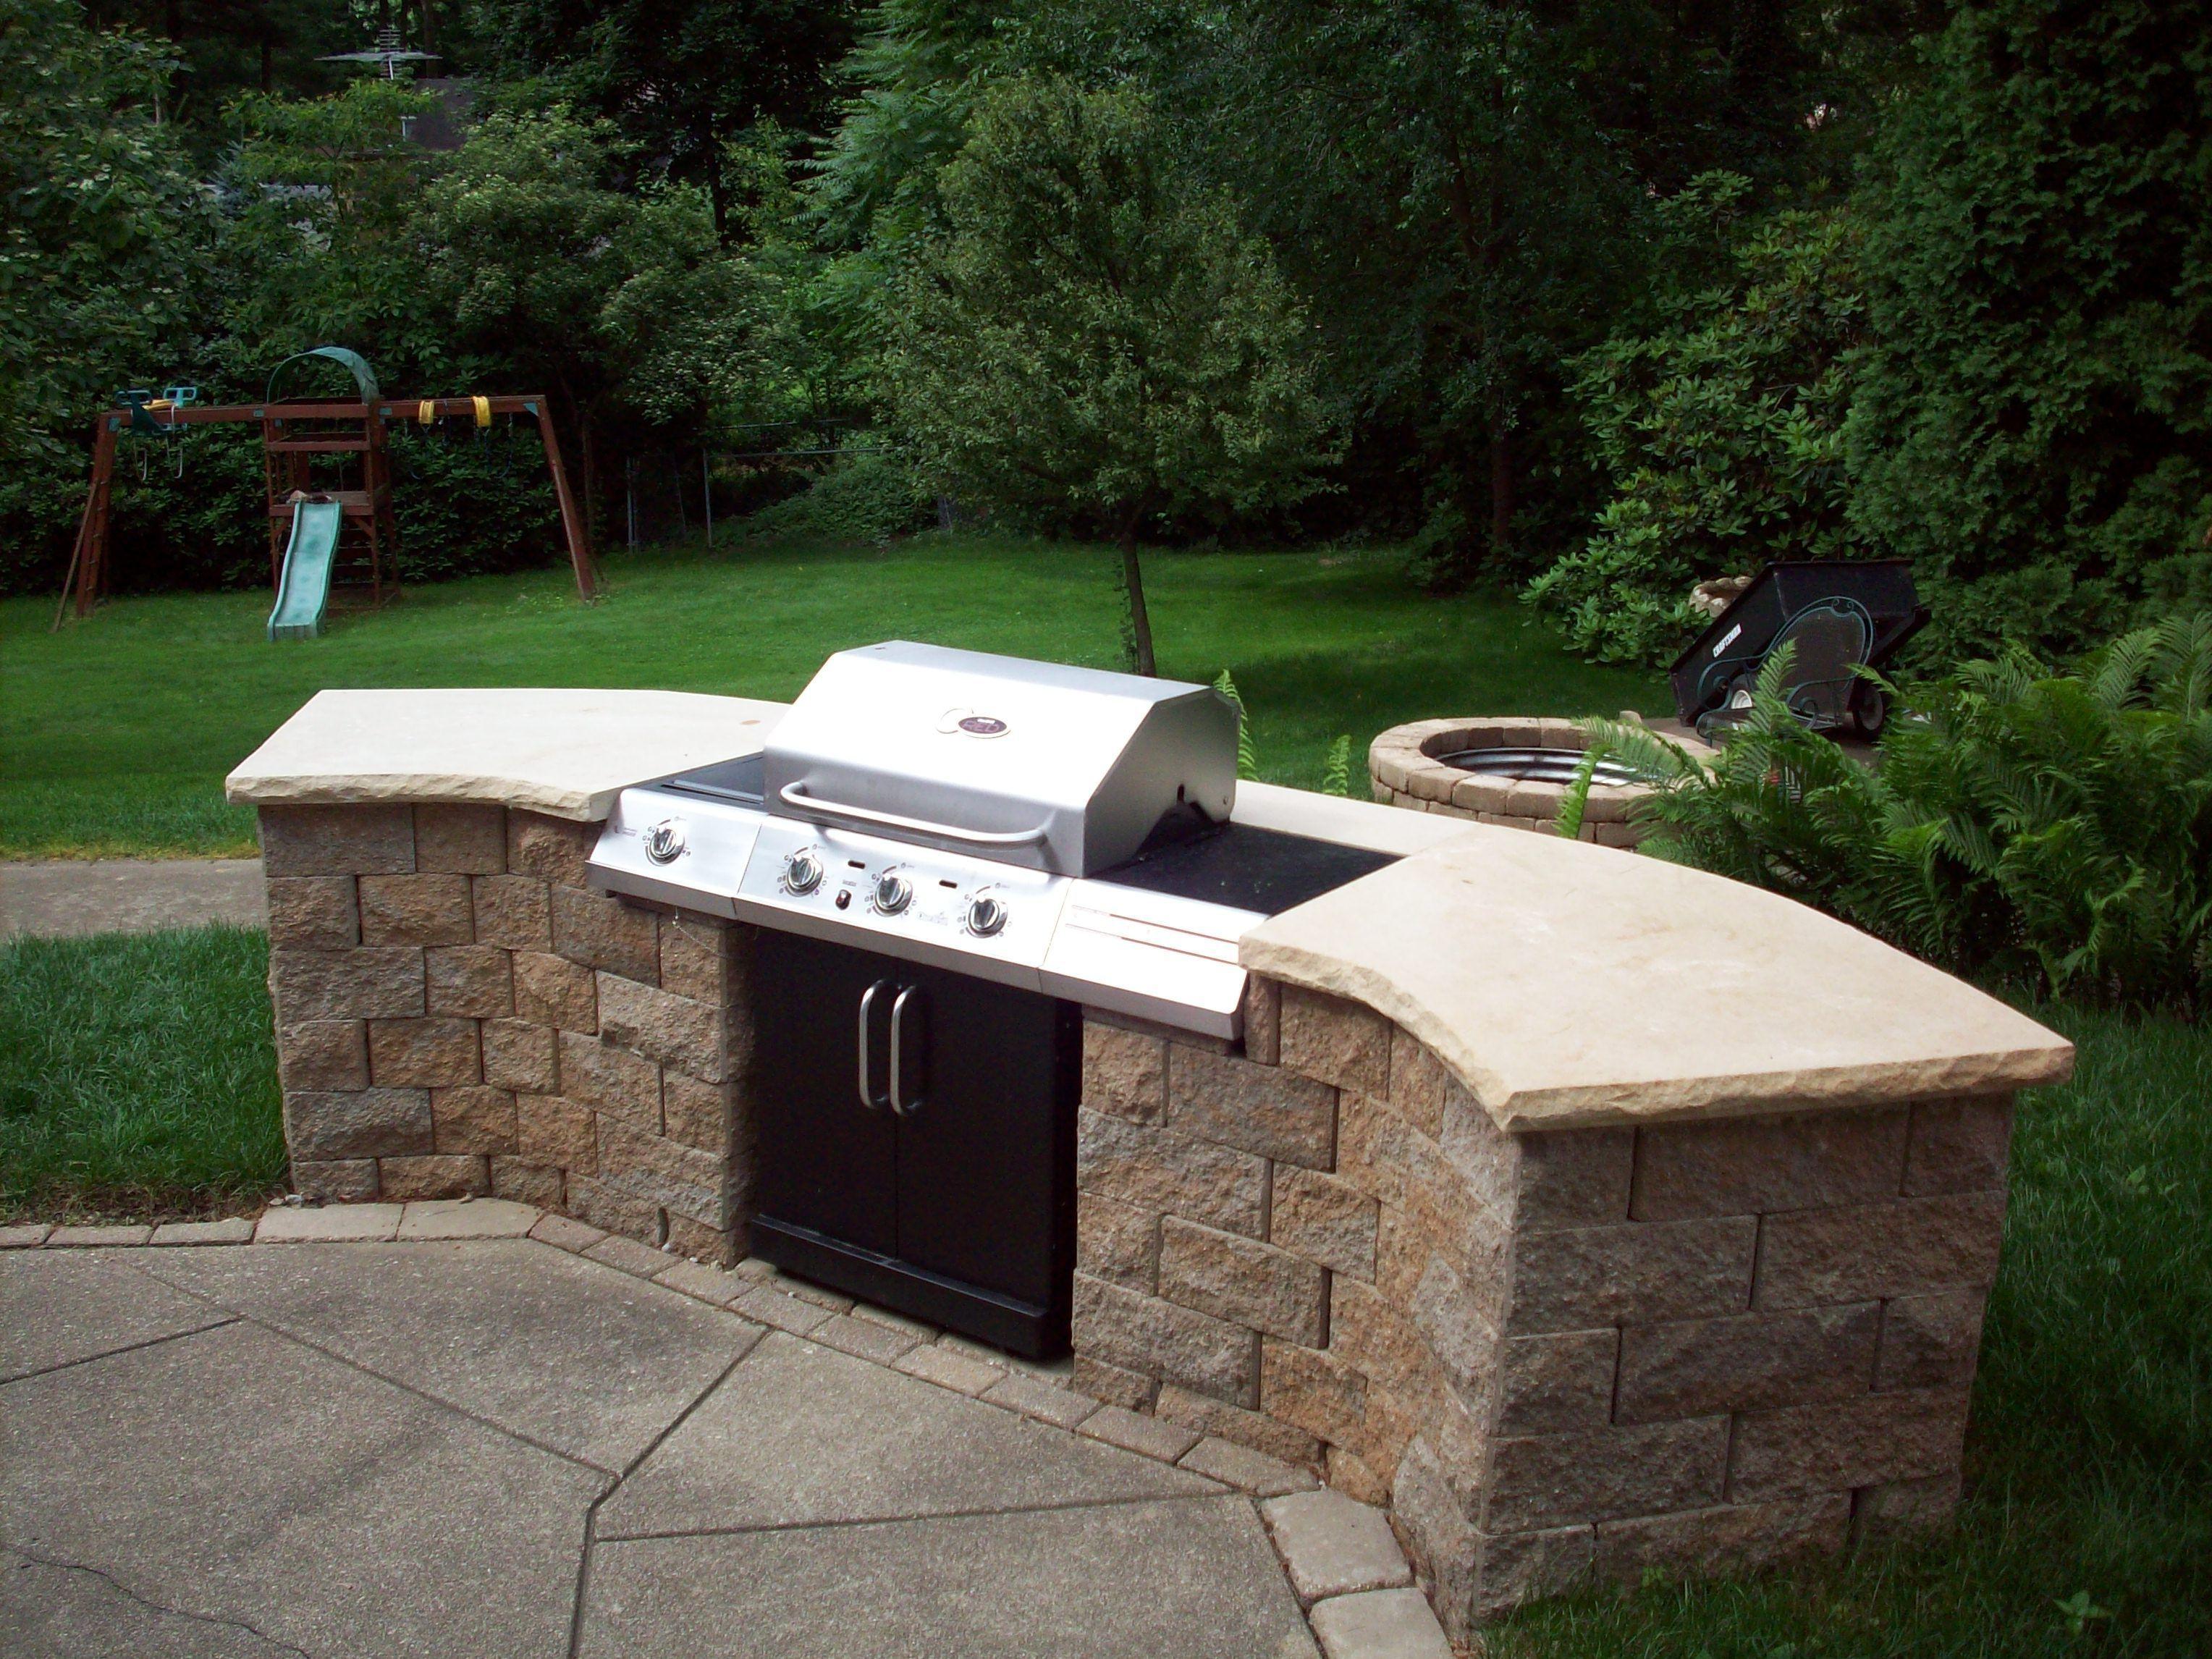 Diy outdoor kitchen kits  outdoor grill surround ideas  Allen block builtin grill with